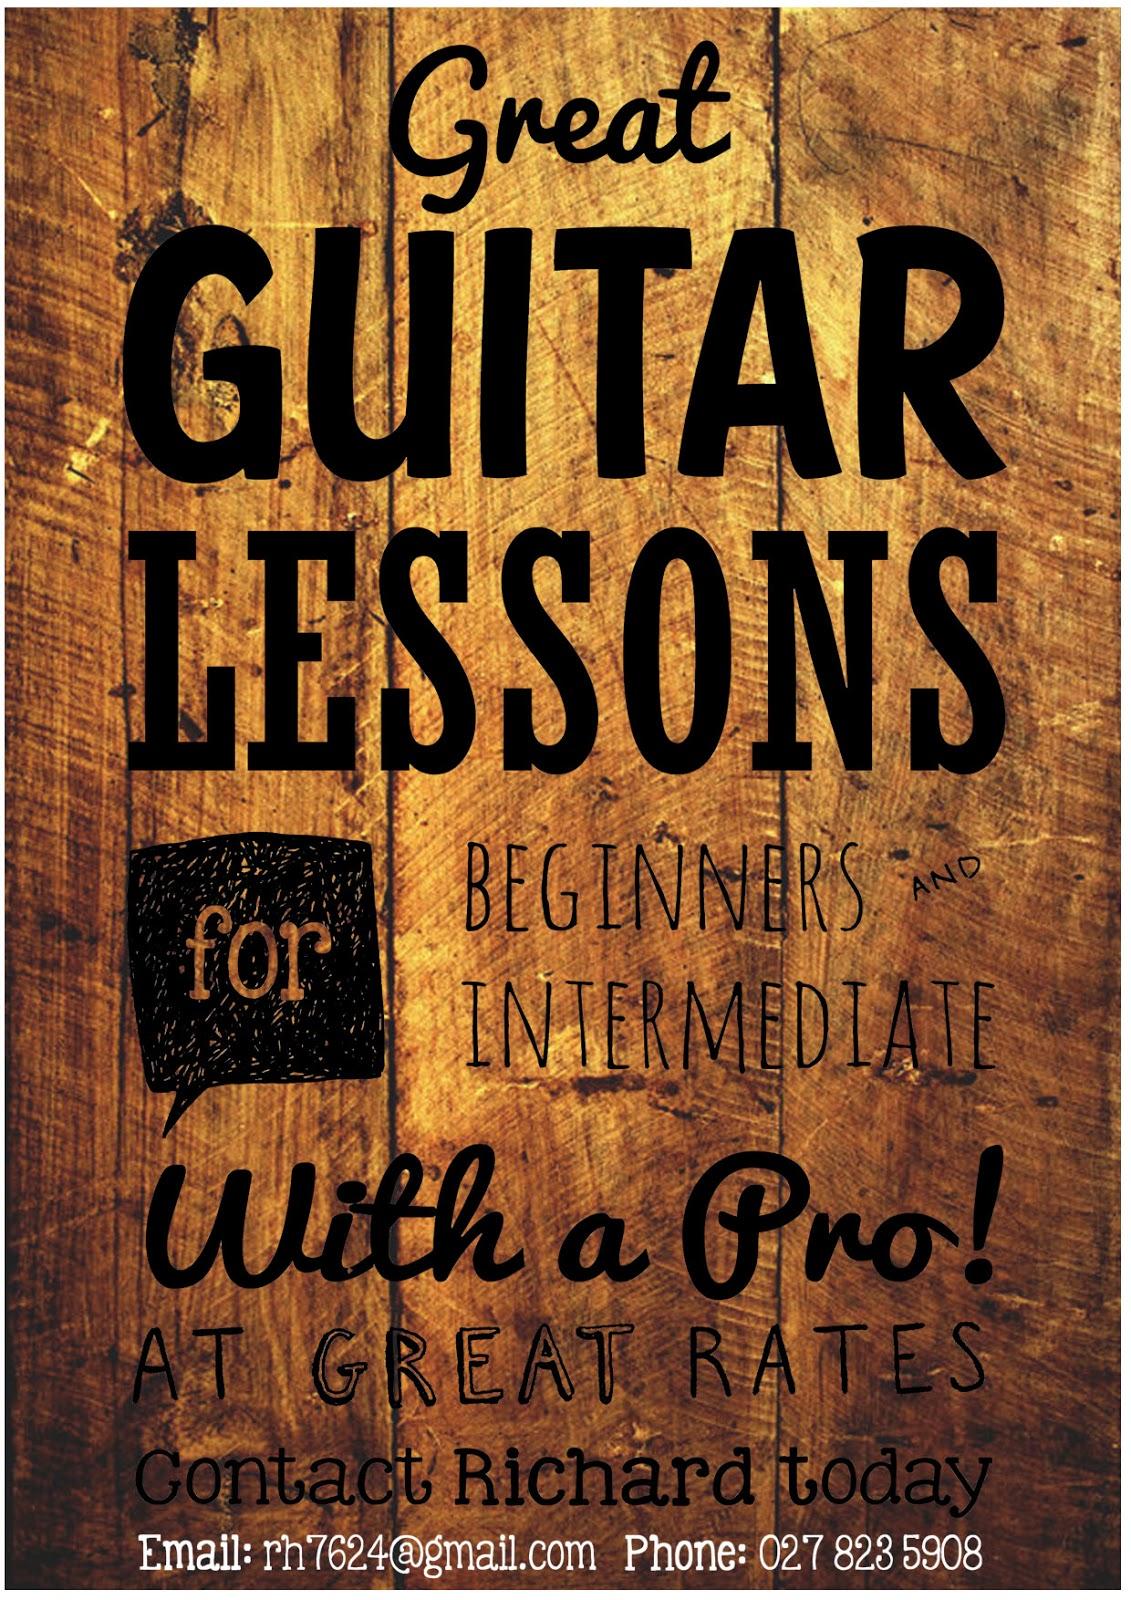 guitarra lessons: